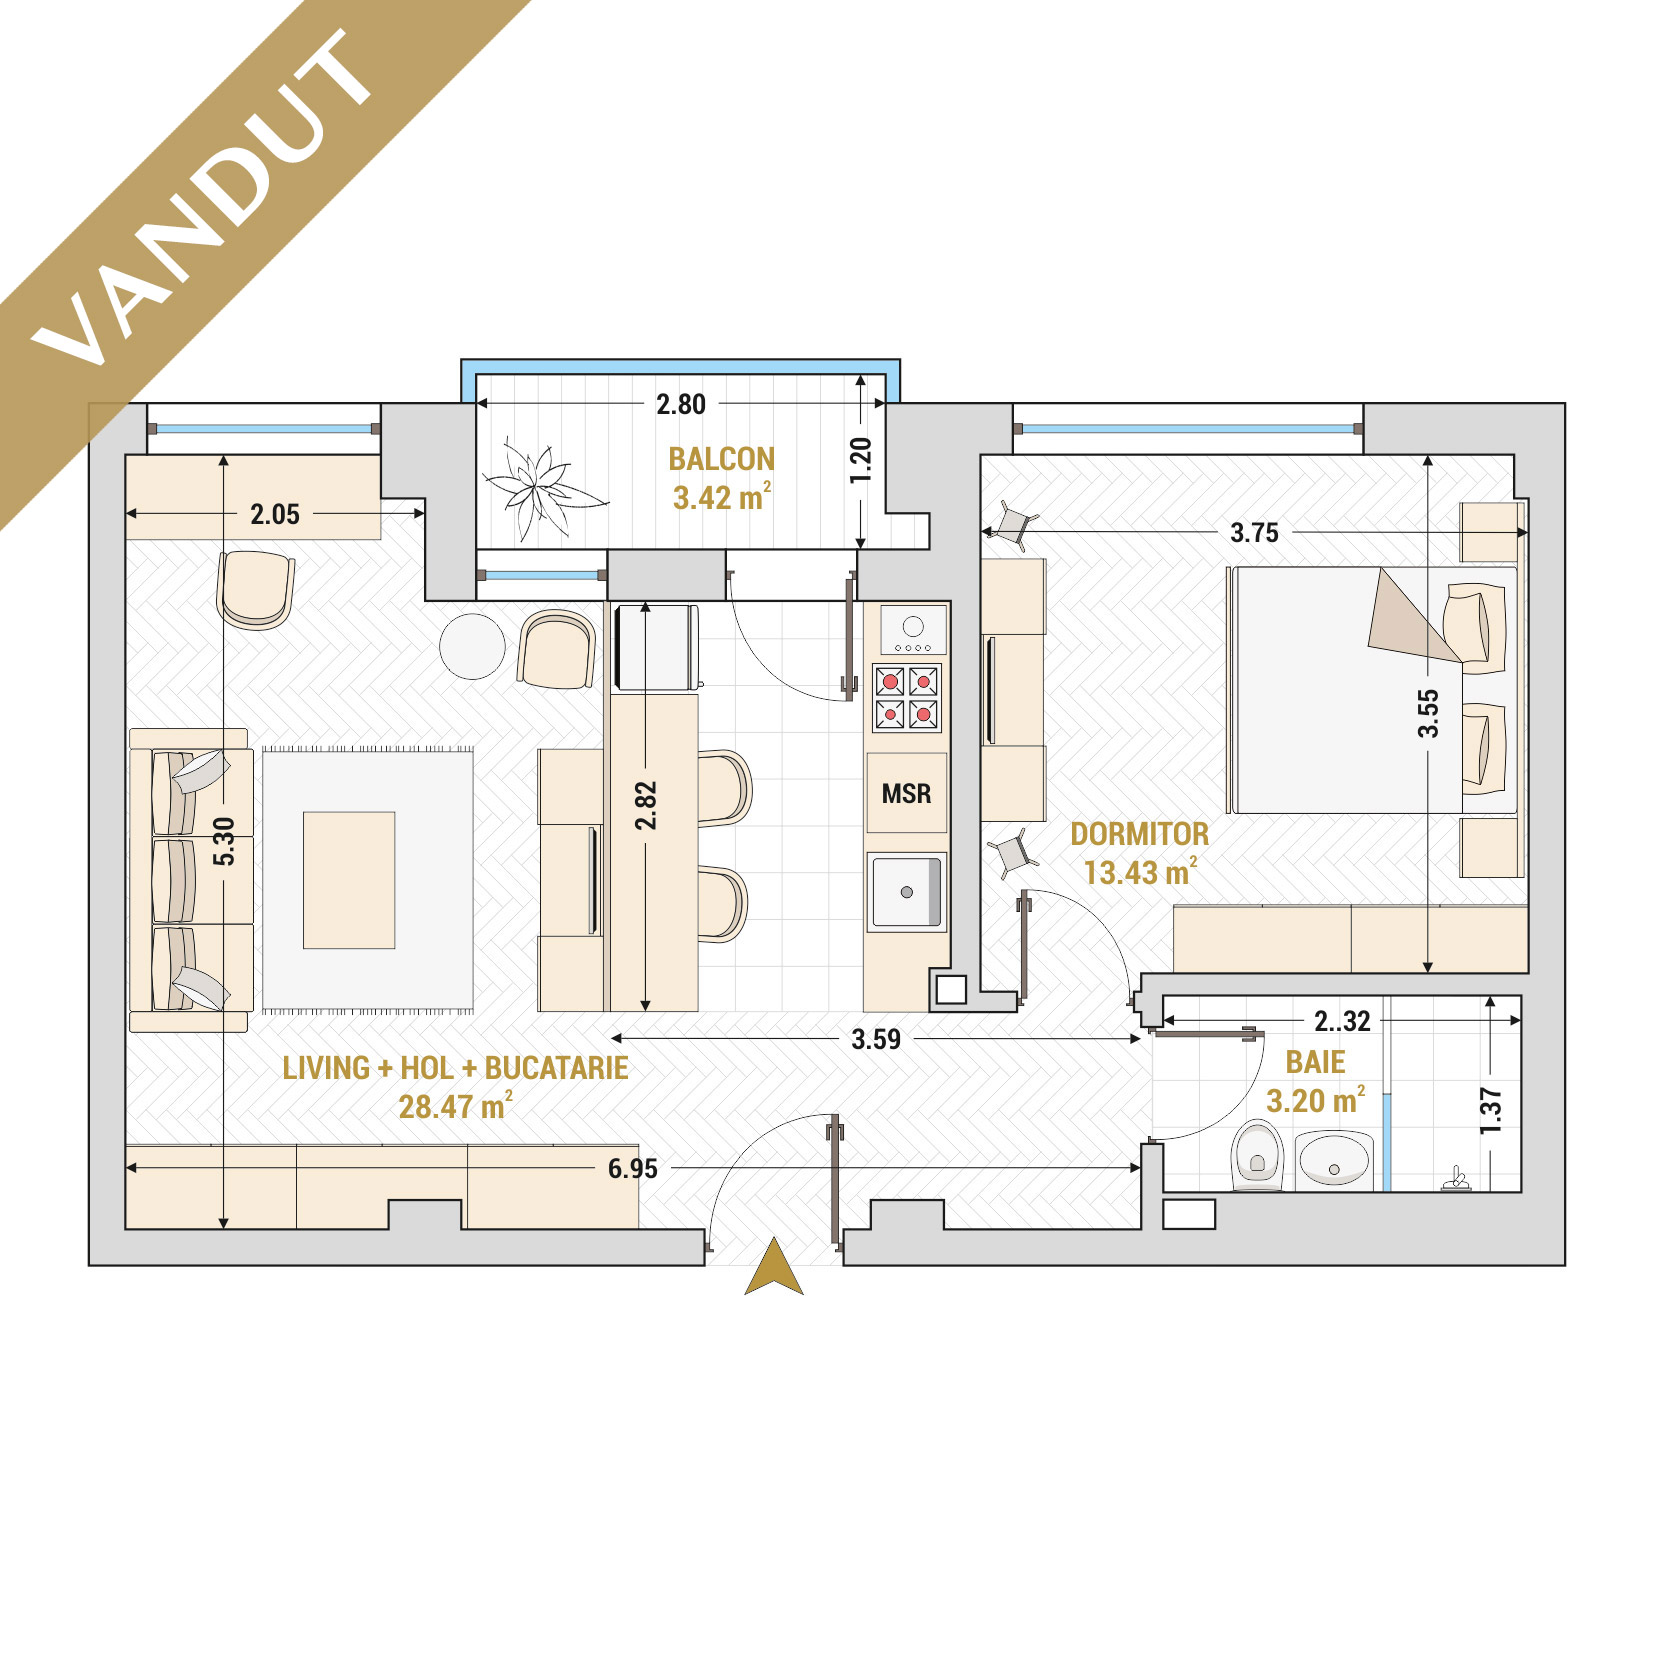 Apartamente cu 2 camere de vanzare Bucuresti - Catedral Residence - Marriott, Piata Unirii, 13 Septembrie, Izvor - Tip 1 - T1A - VANDUT